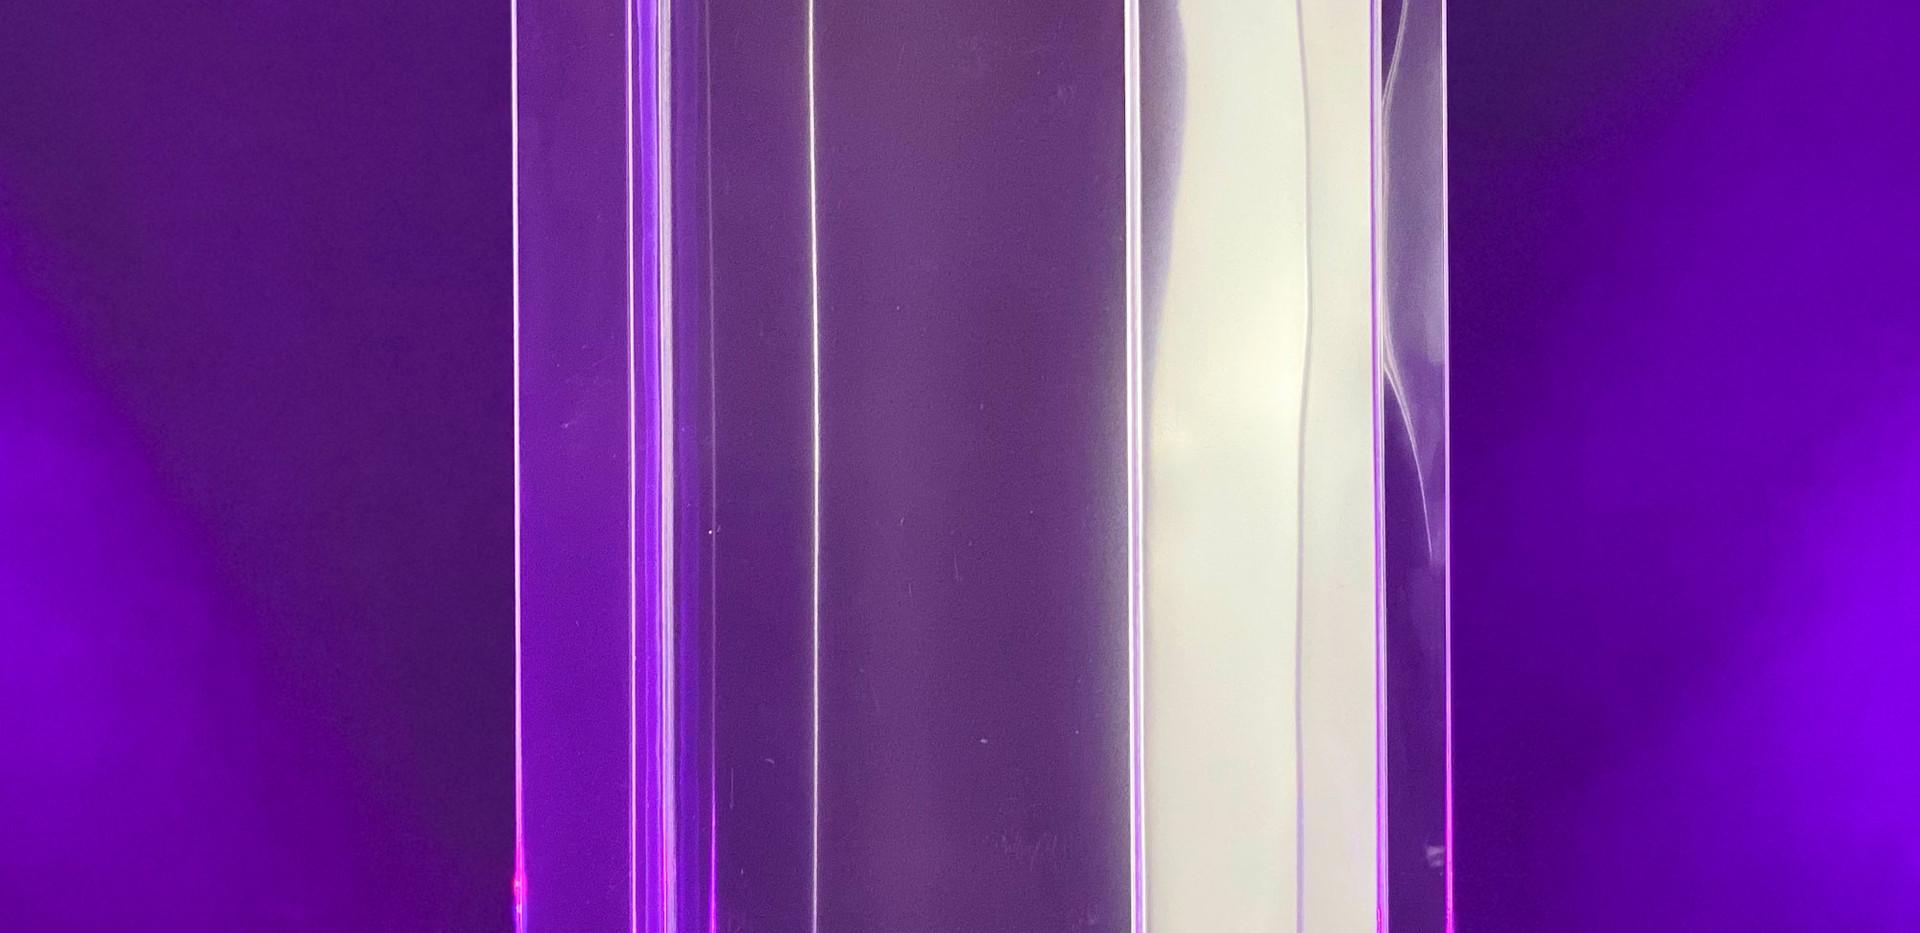 DFR-1-2020-Glam-Shots-Empty1.jpg